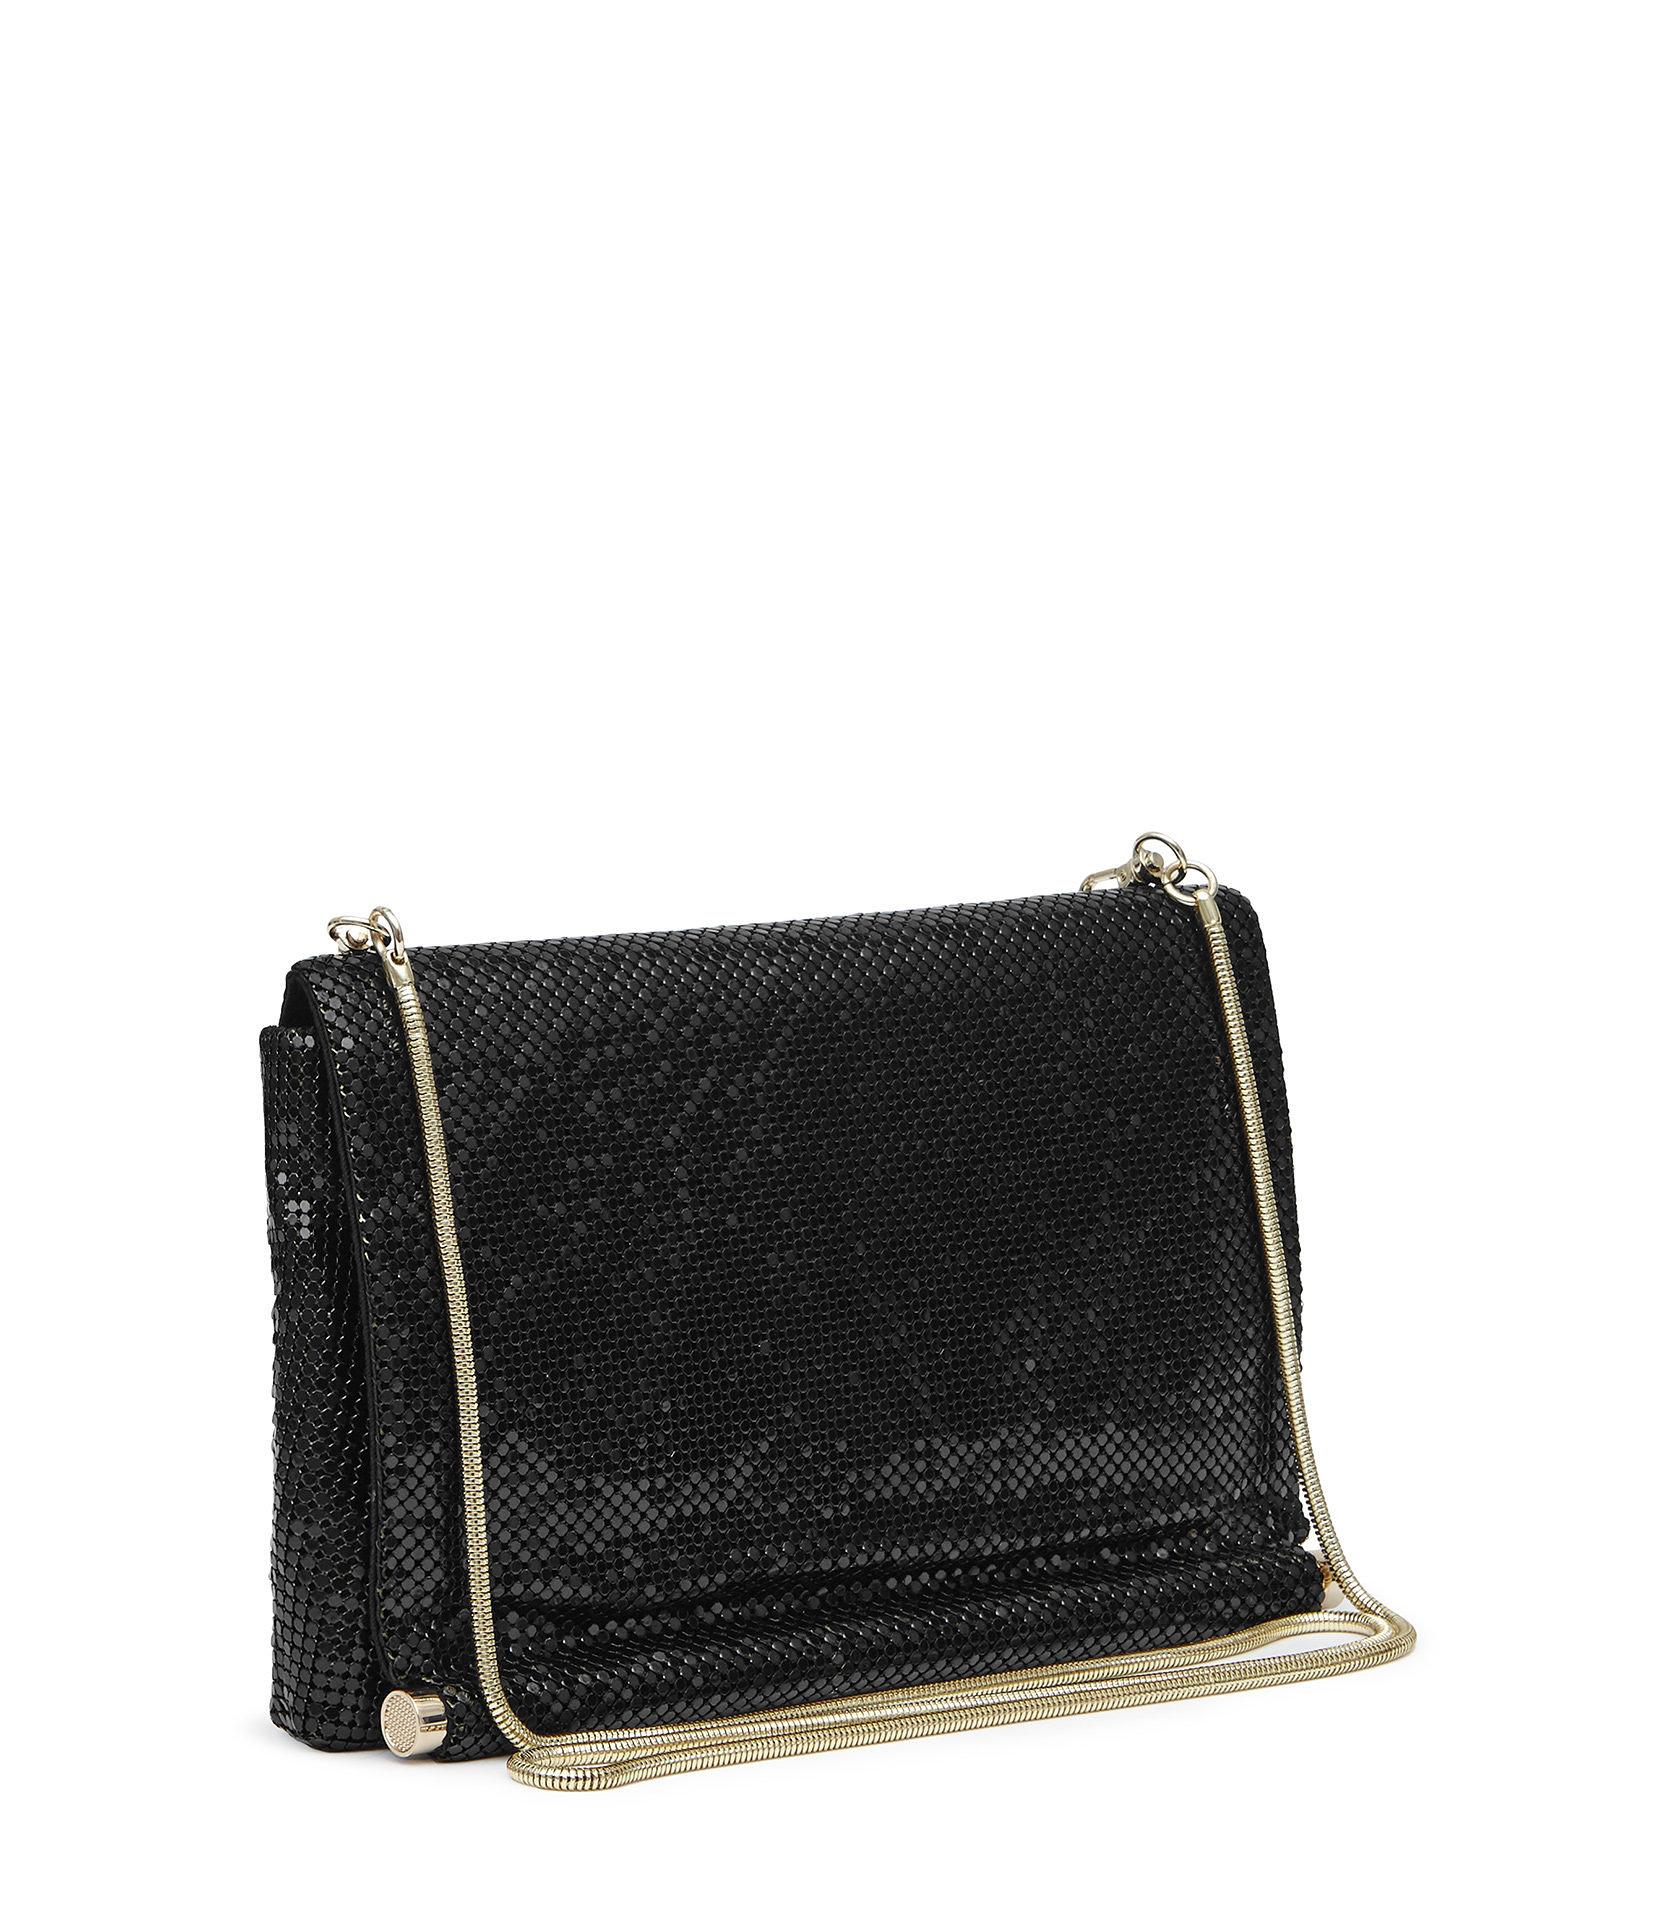 Rosa chainmail shoulder bag2